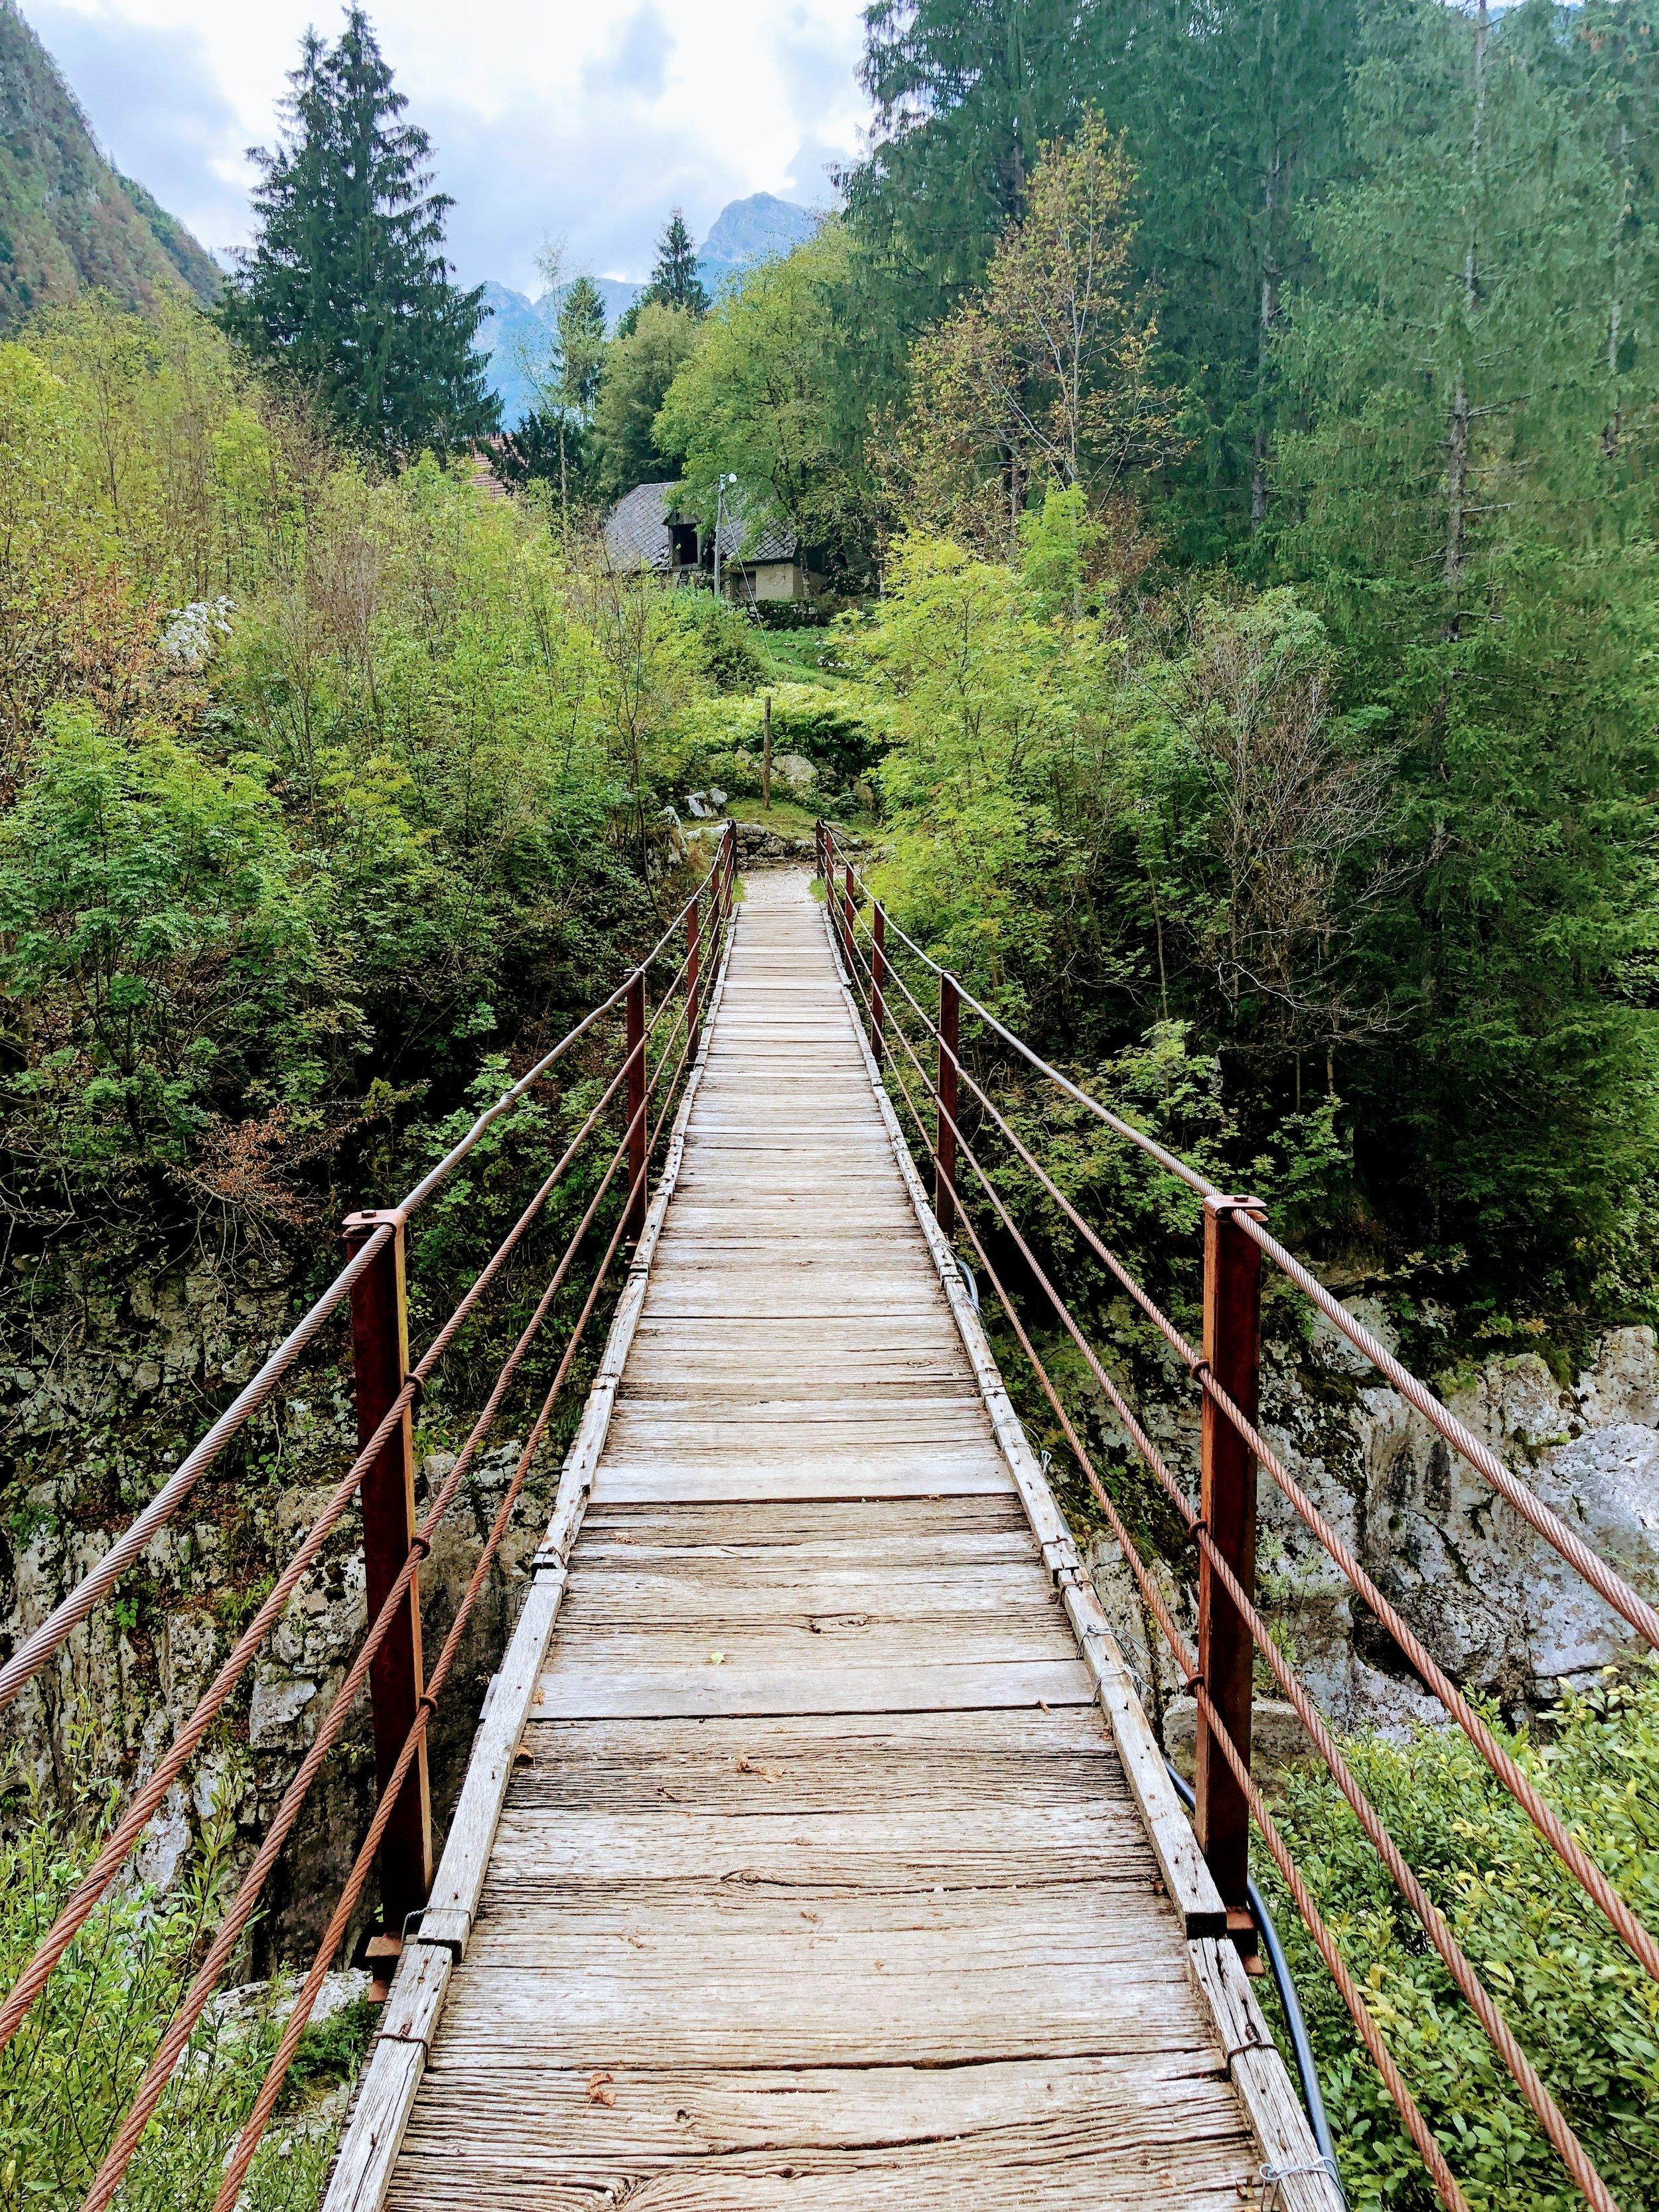 Cable footbridge, Velika Korita Soce, on the Soce River, Slovenia